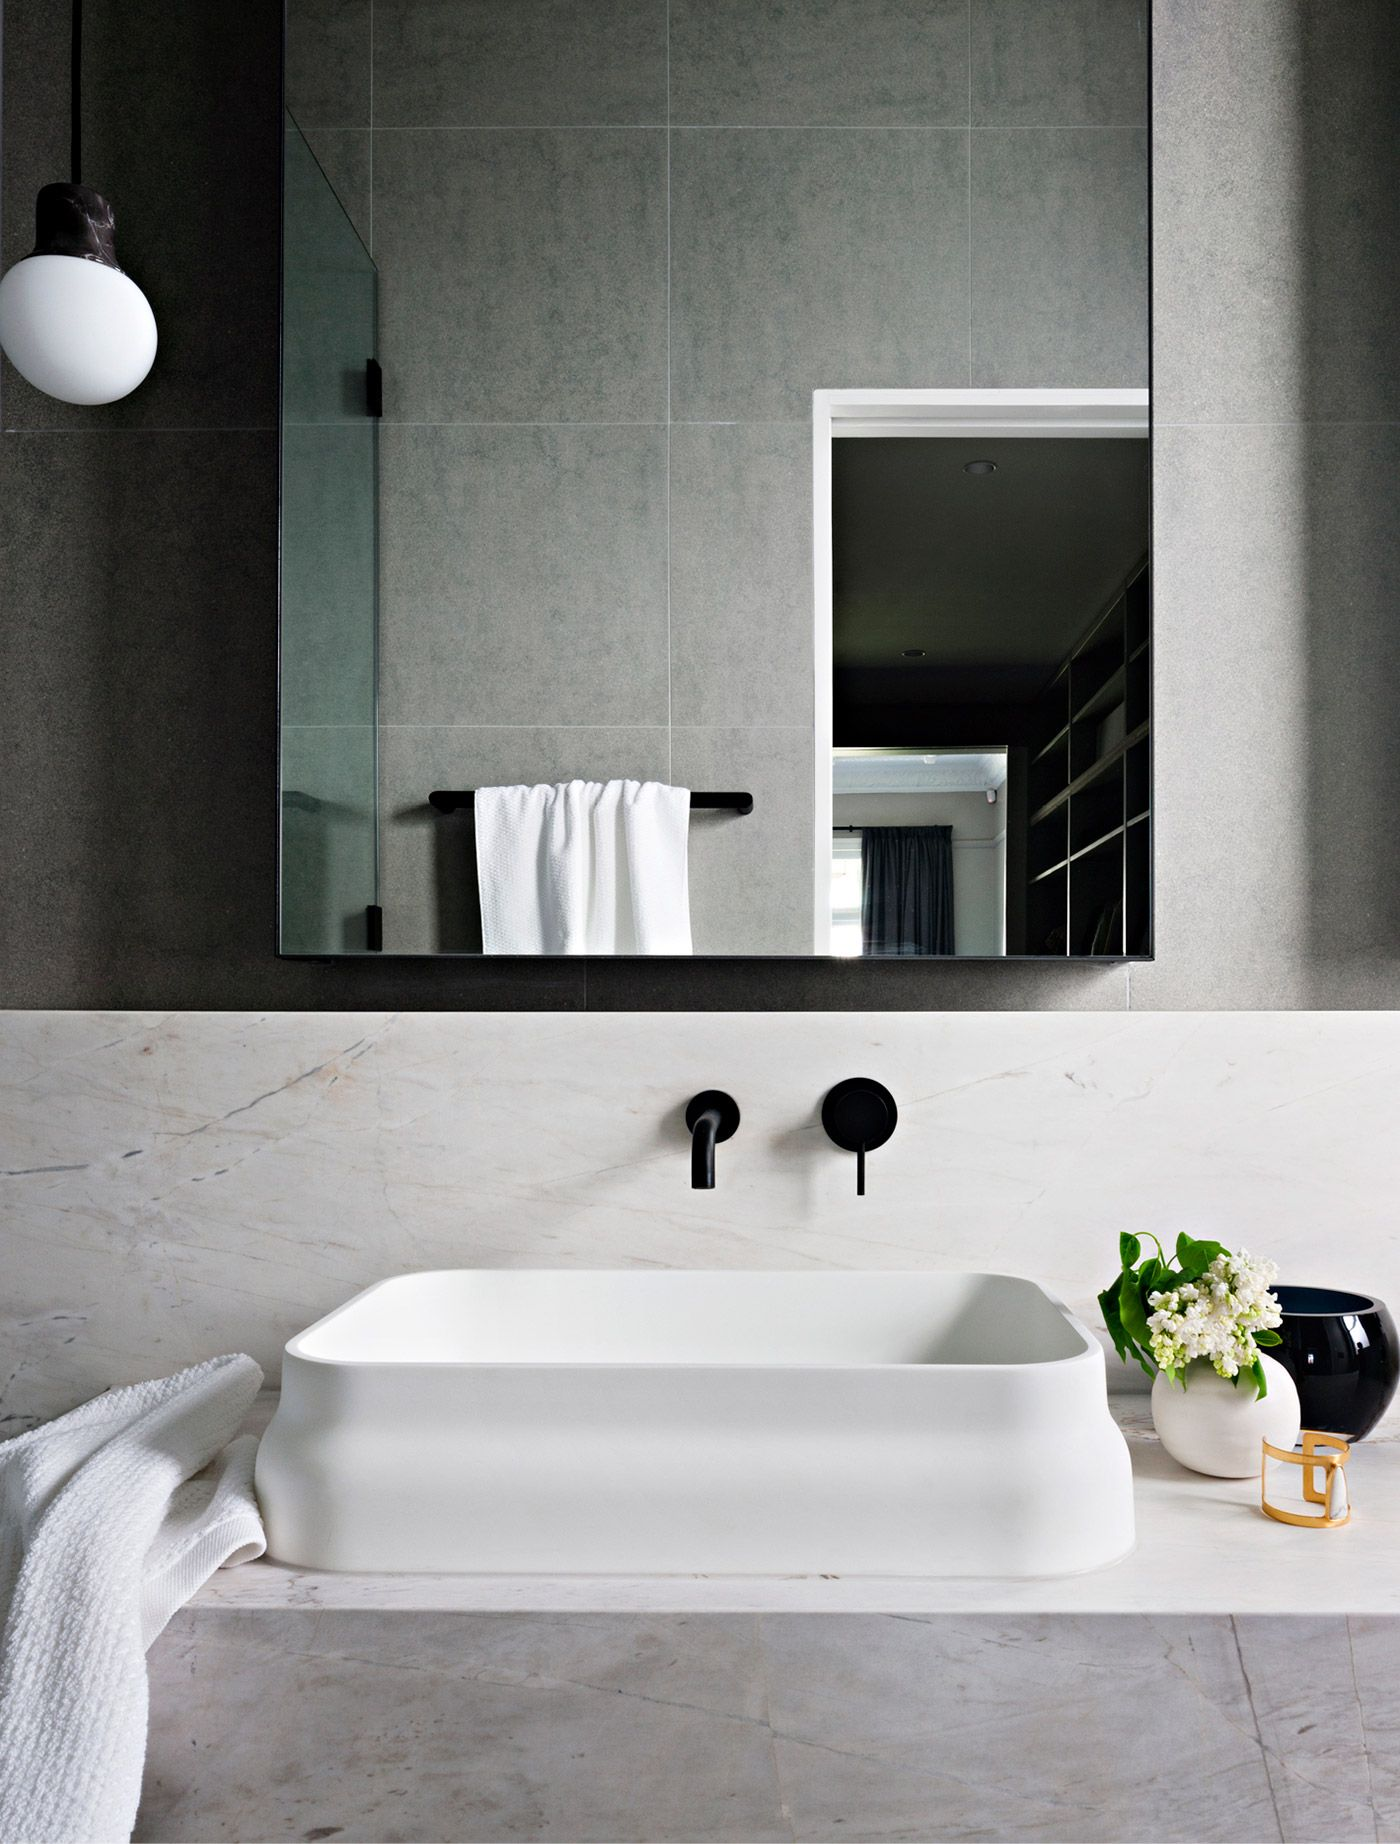 Tags rustic bathroom natural minimal monochrome - Modern Bathroom Minimal Bathroom Black And White Bathroom Marble Vanity Black Faucet